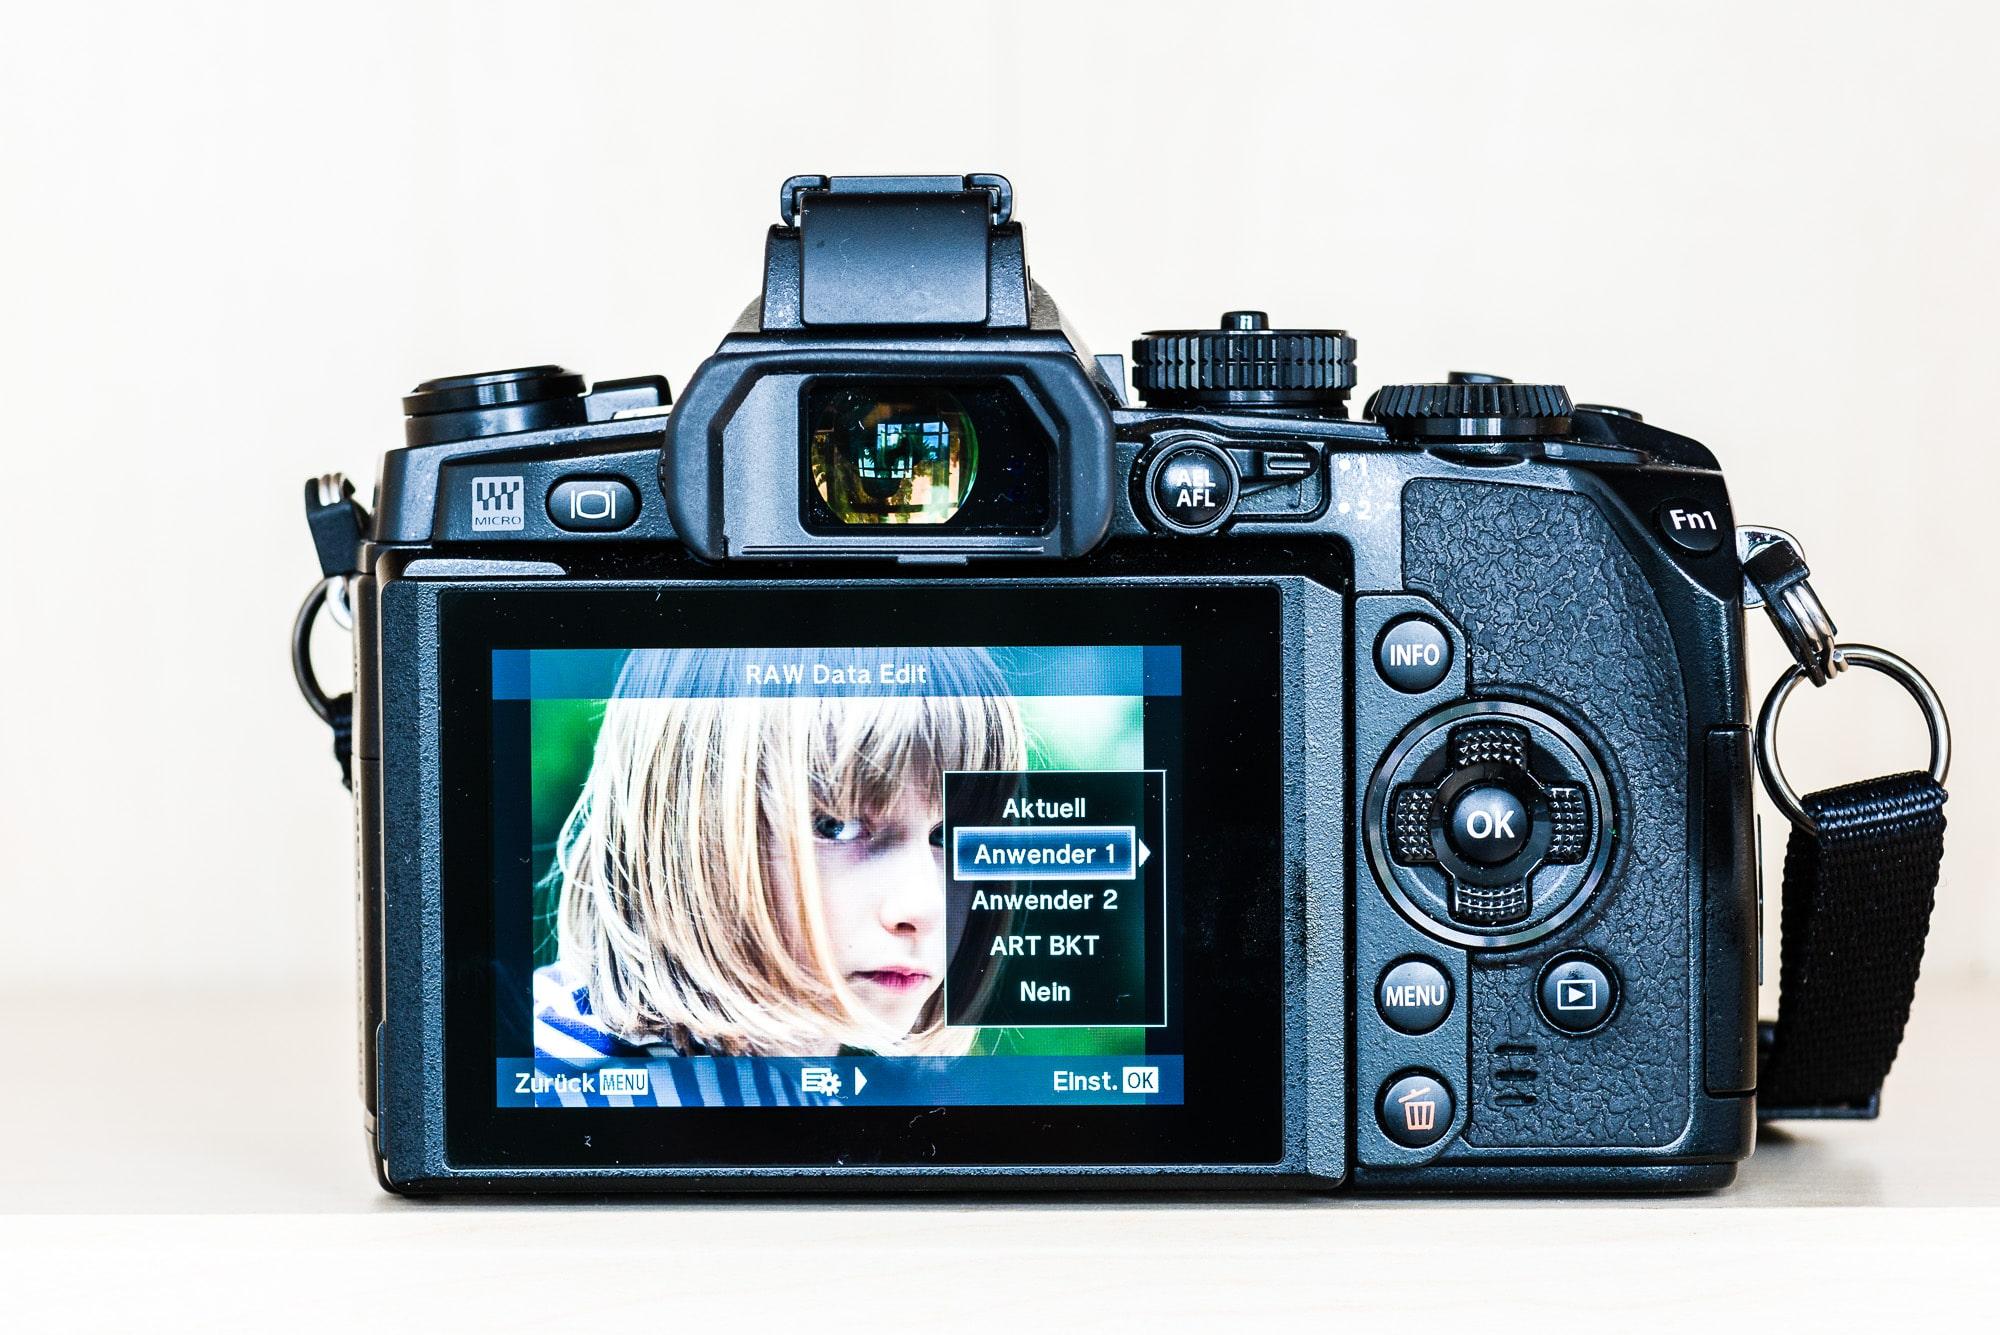 RAW Edit OM-D EM1, Anwenderpreset, (Foto copyright - Frank Weber - Berlin - fotologbuch.de)